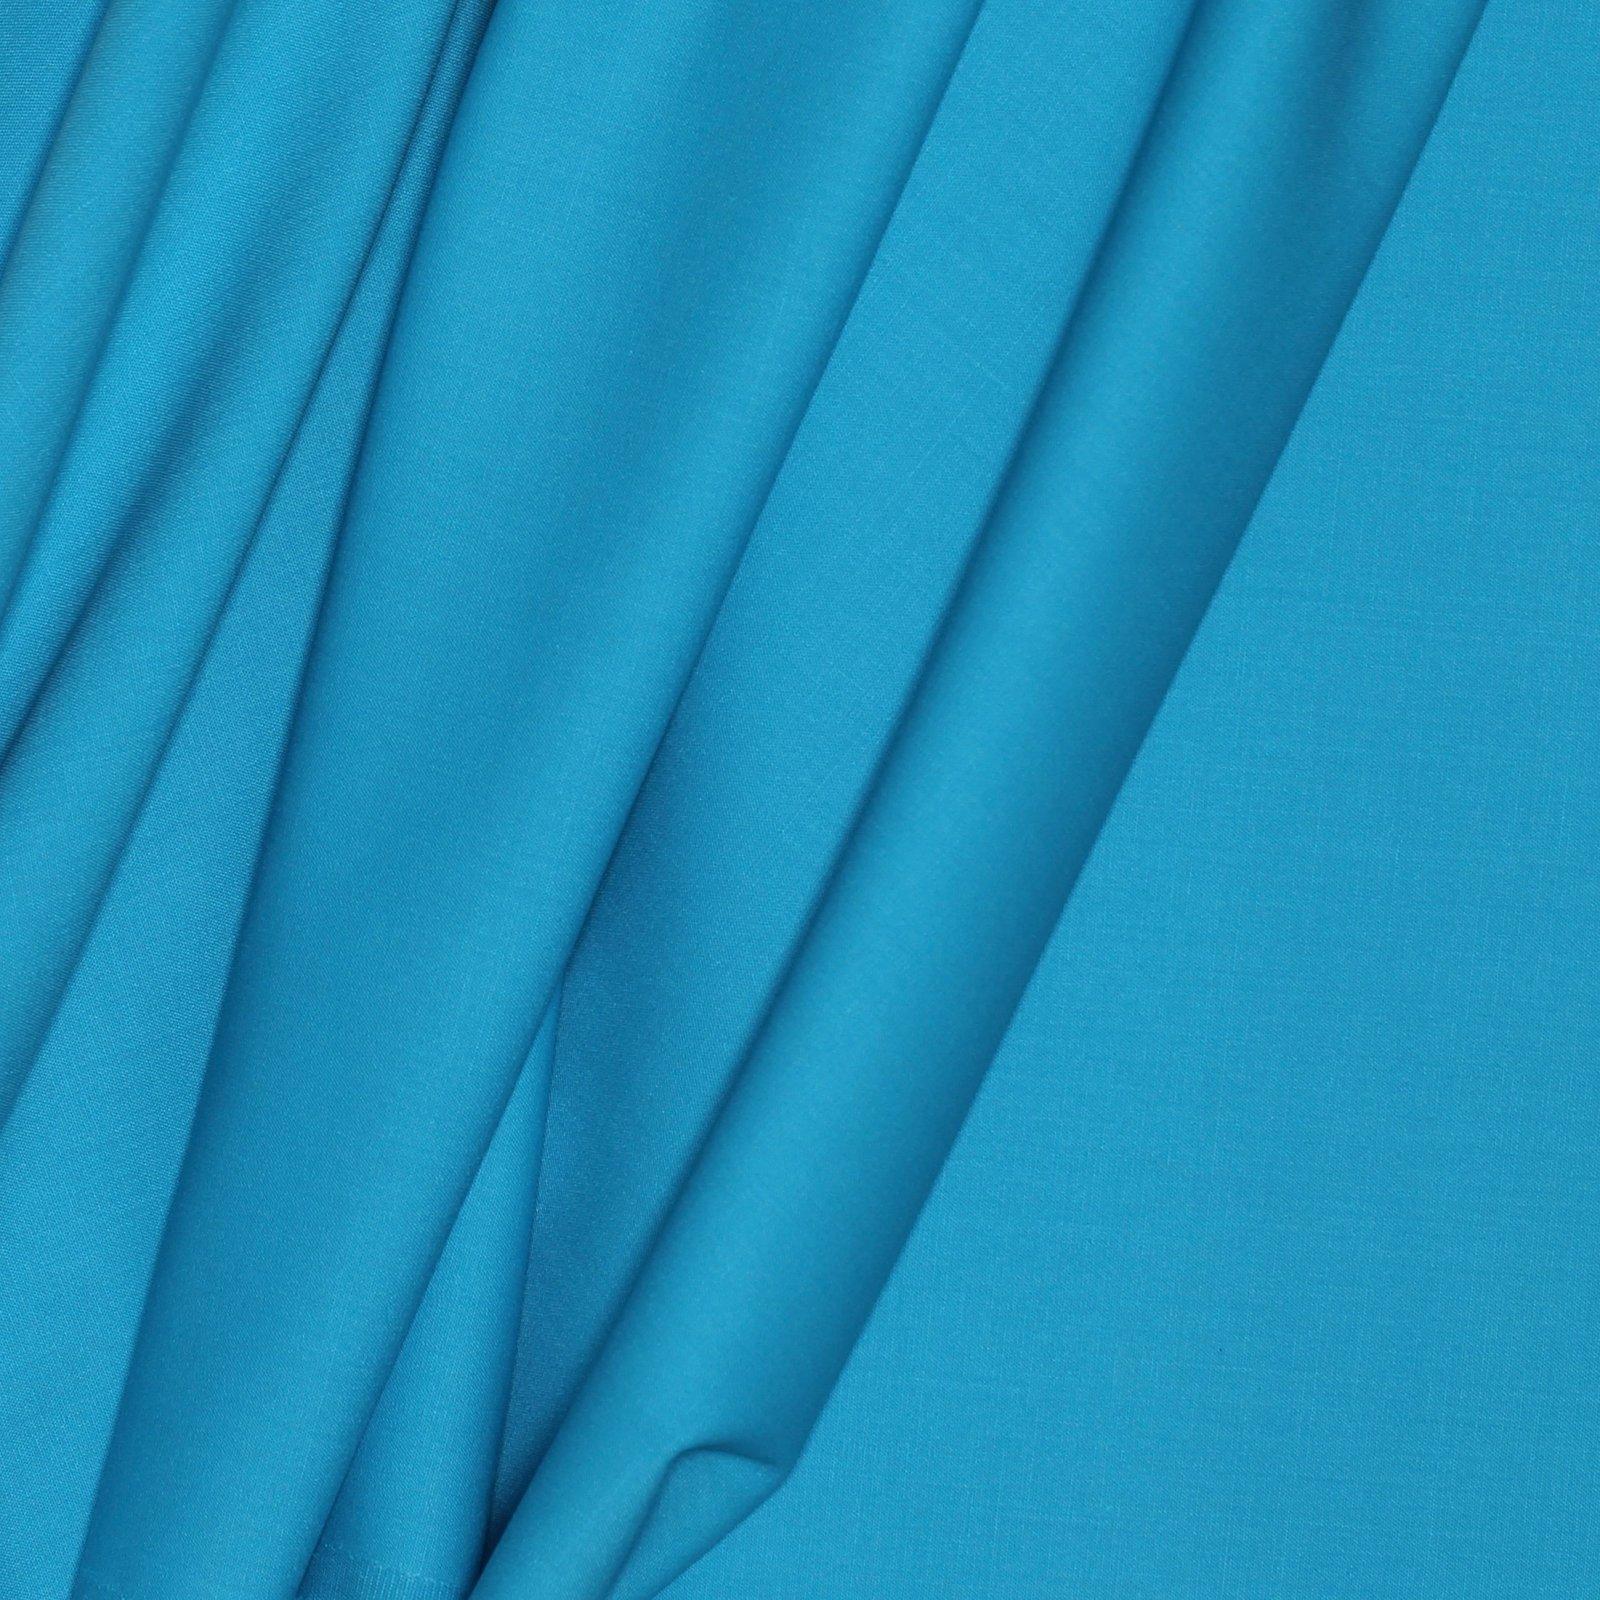 Sky Blue Smooth Italian Wool/Lyrca Crepe